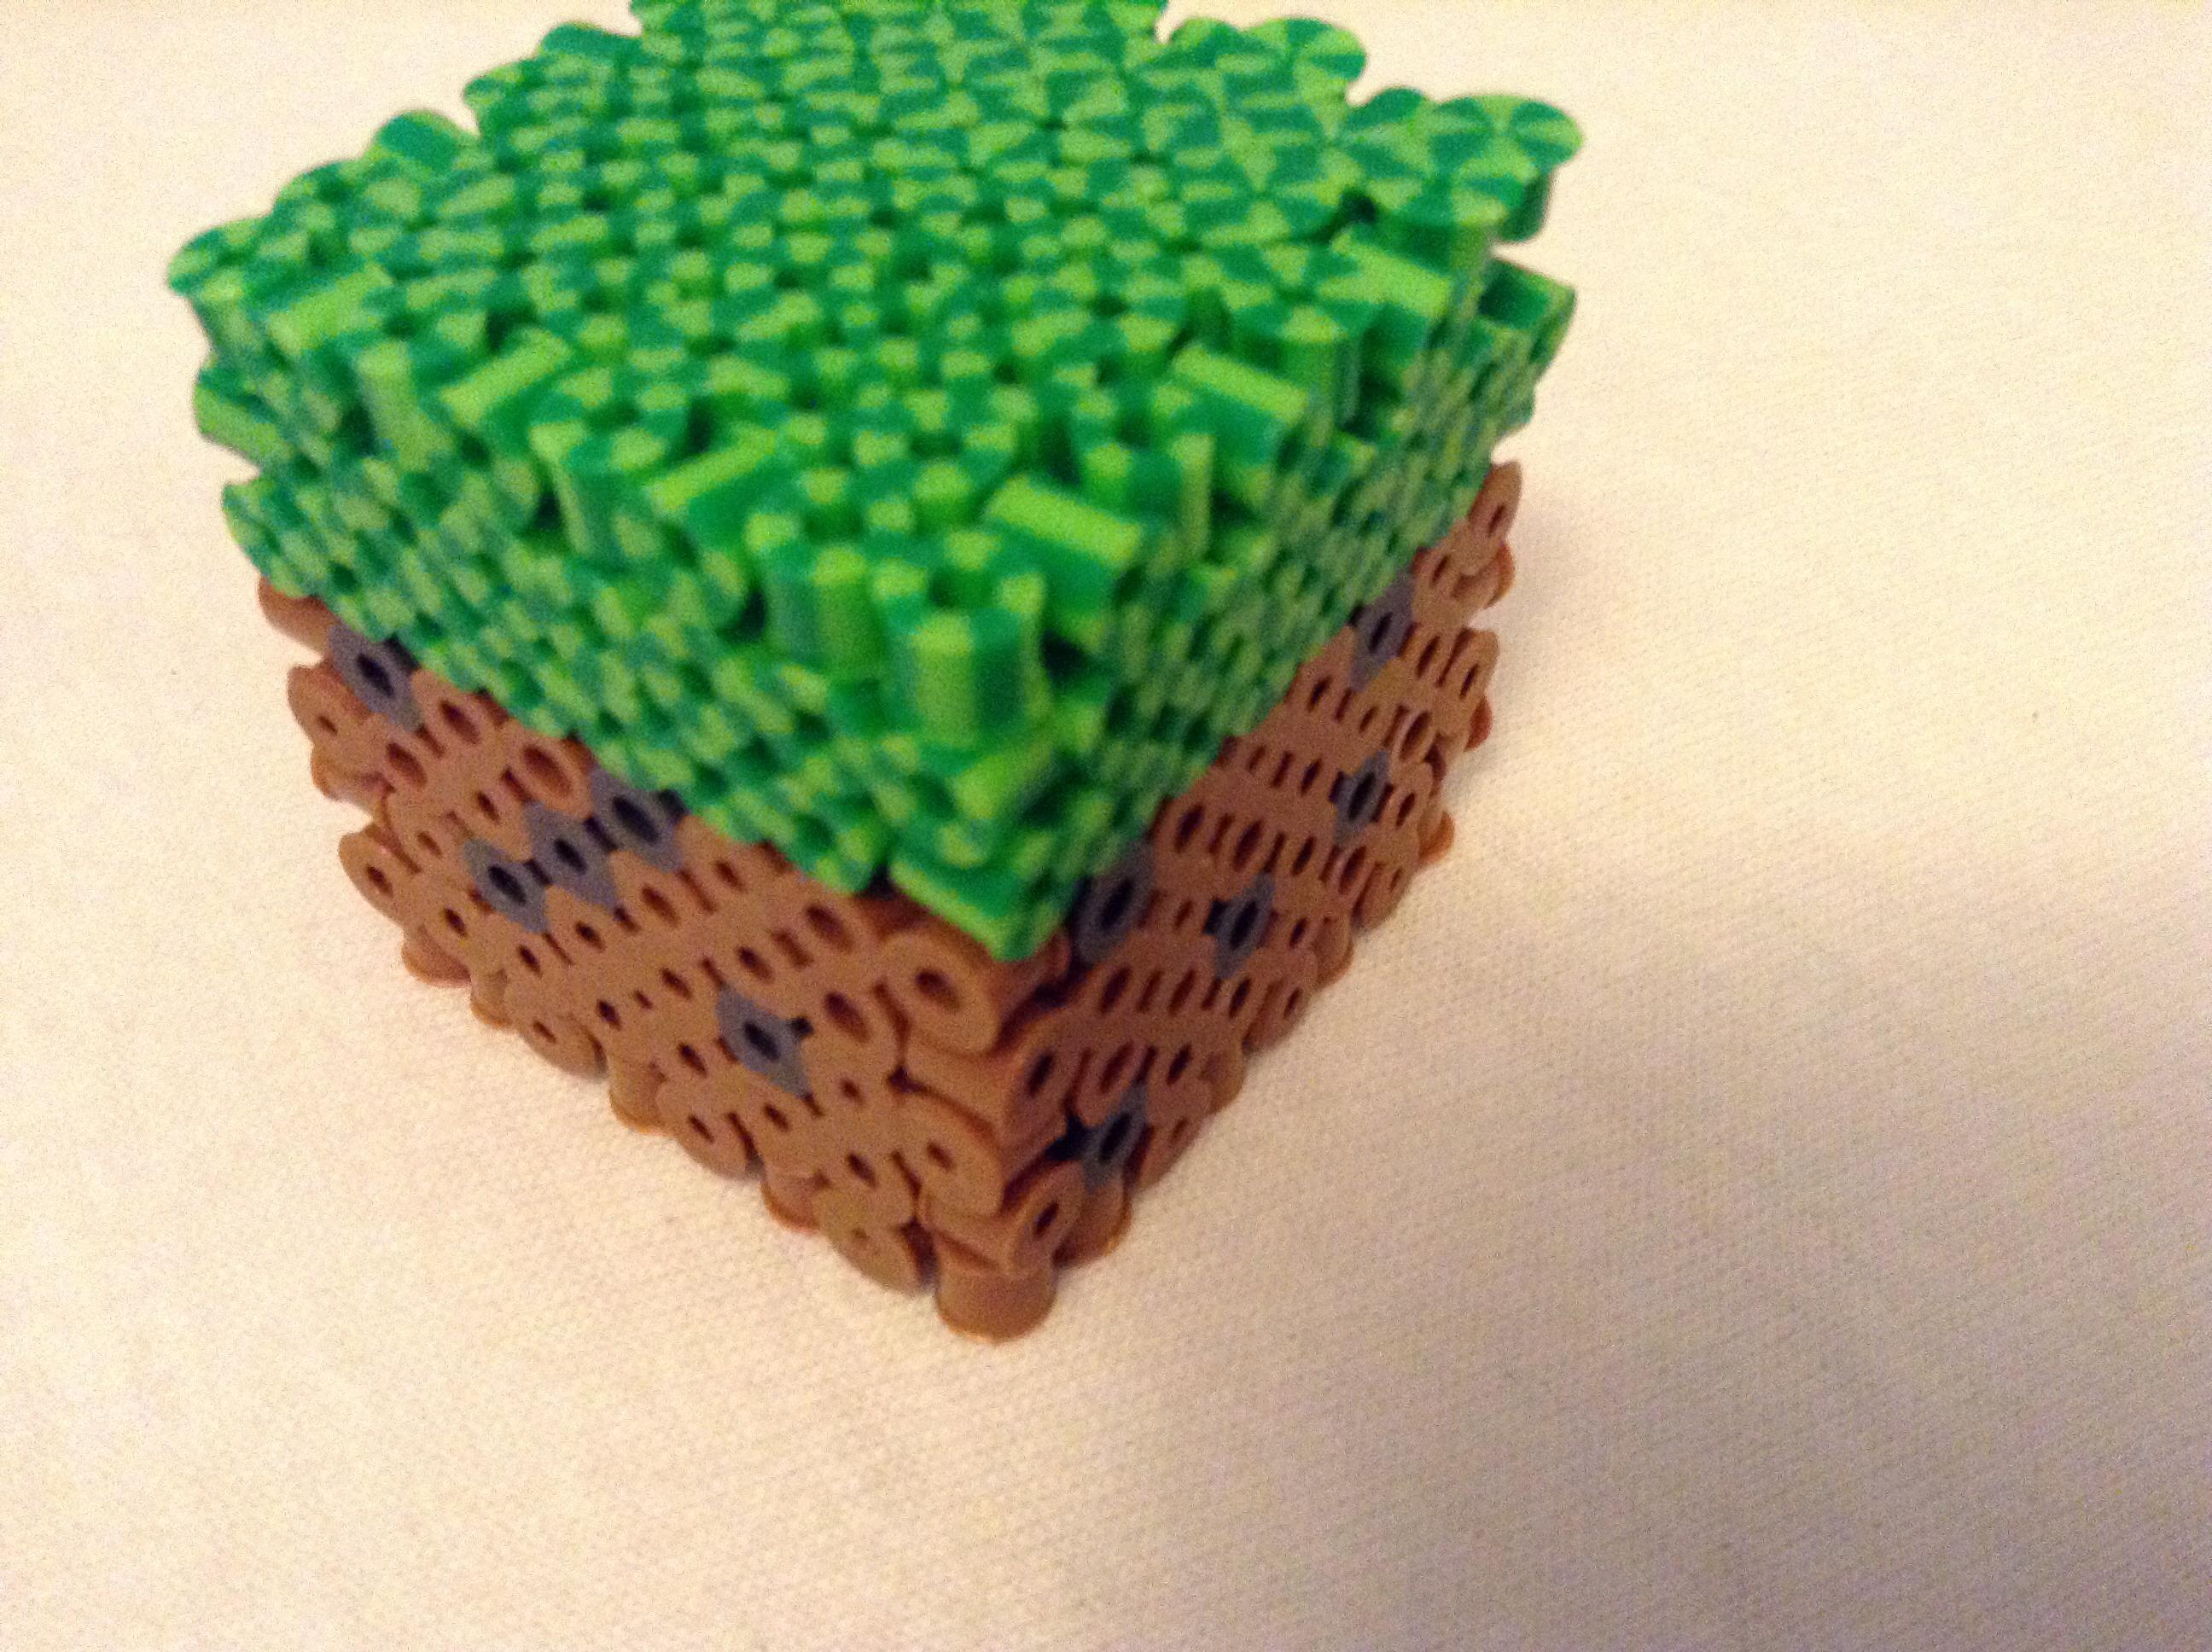 Minecraft Dirt Block